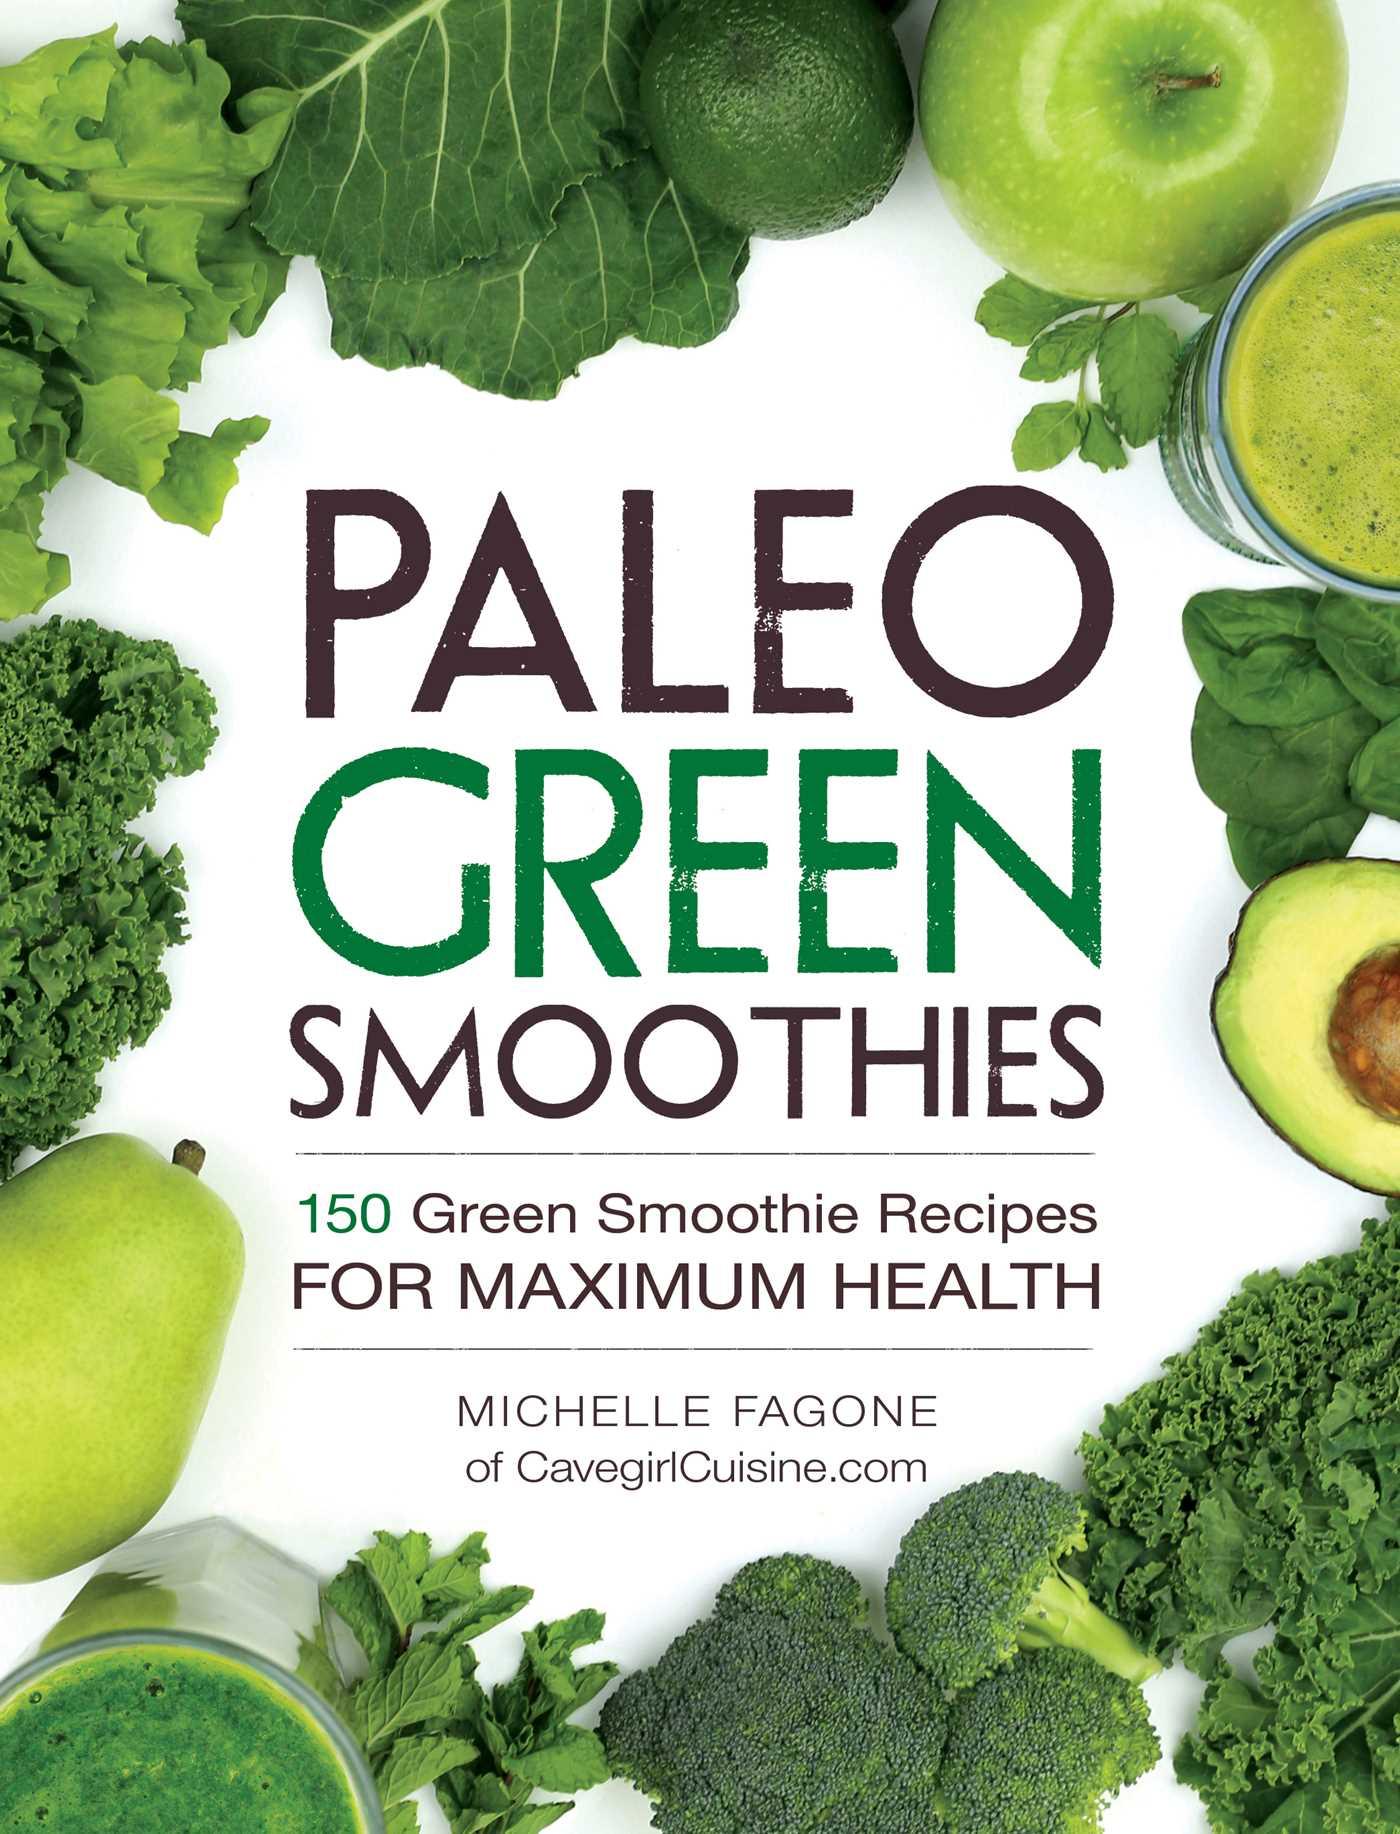 Paleo green smoothies 9781440592935 hr